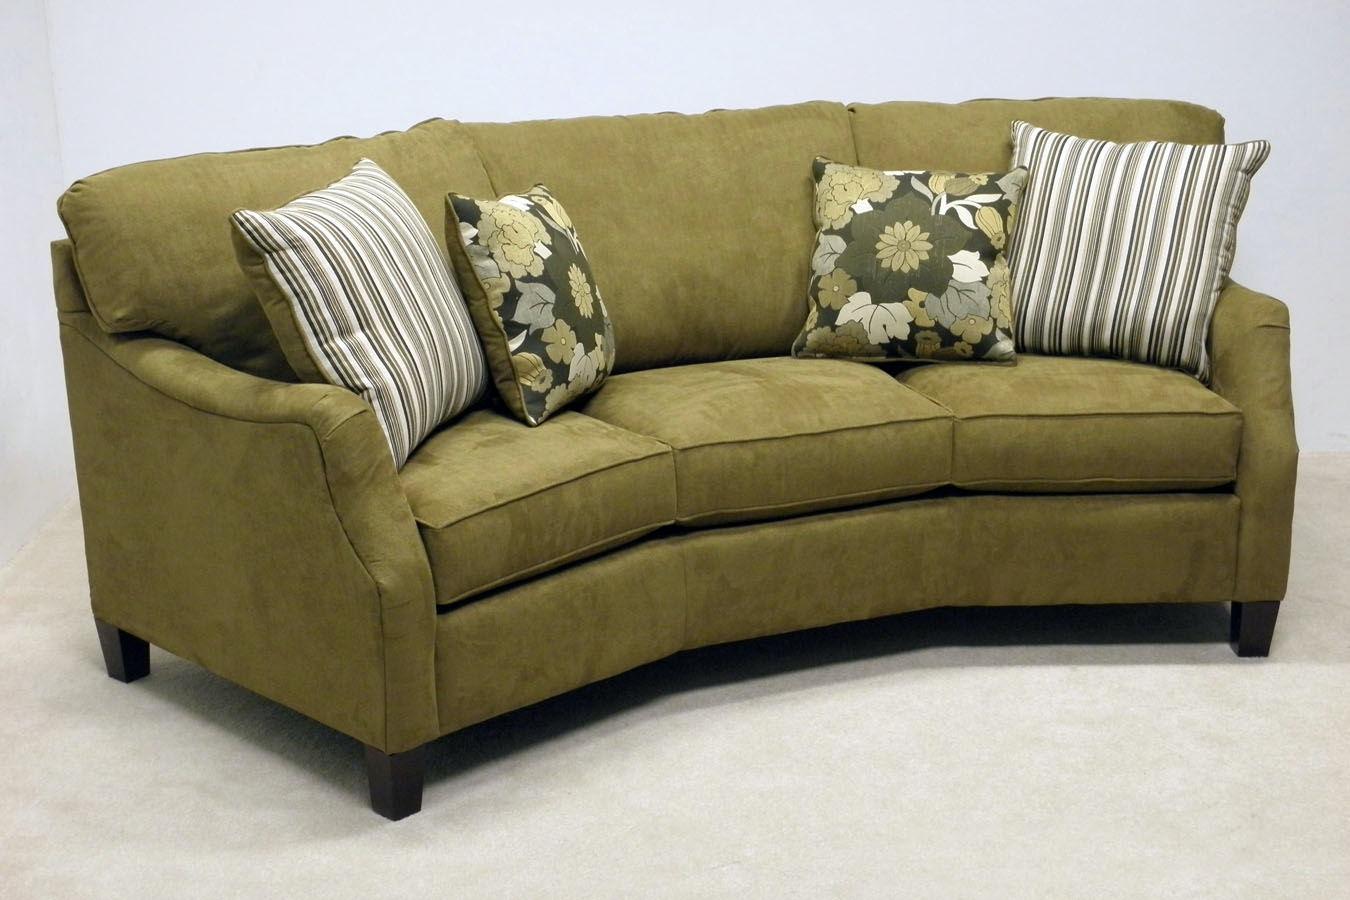 LaCrosse Living Room 96u0027u0027 No Sag Conversation Sofa